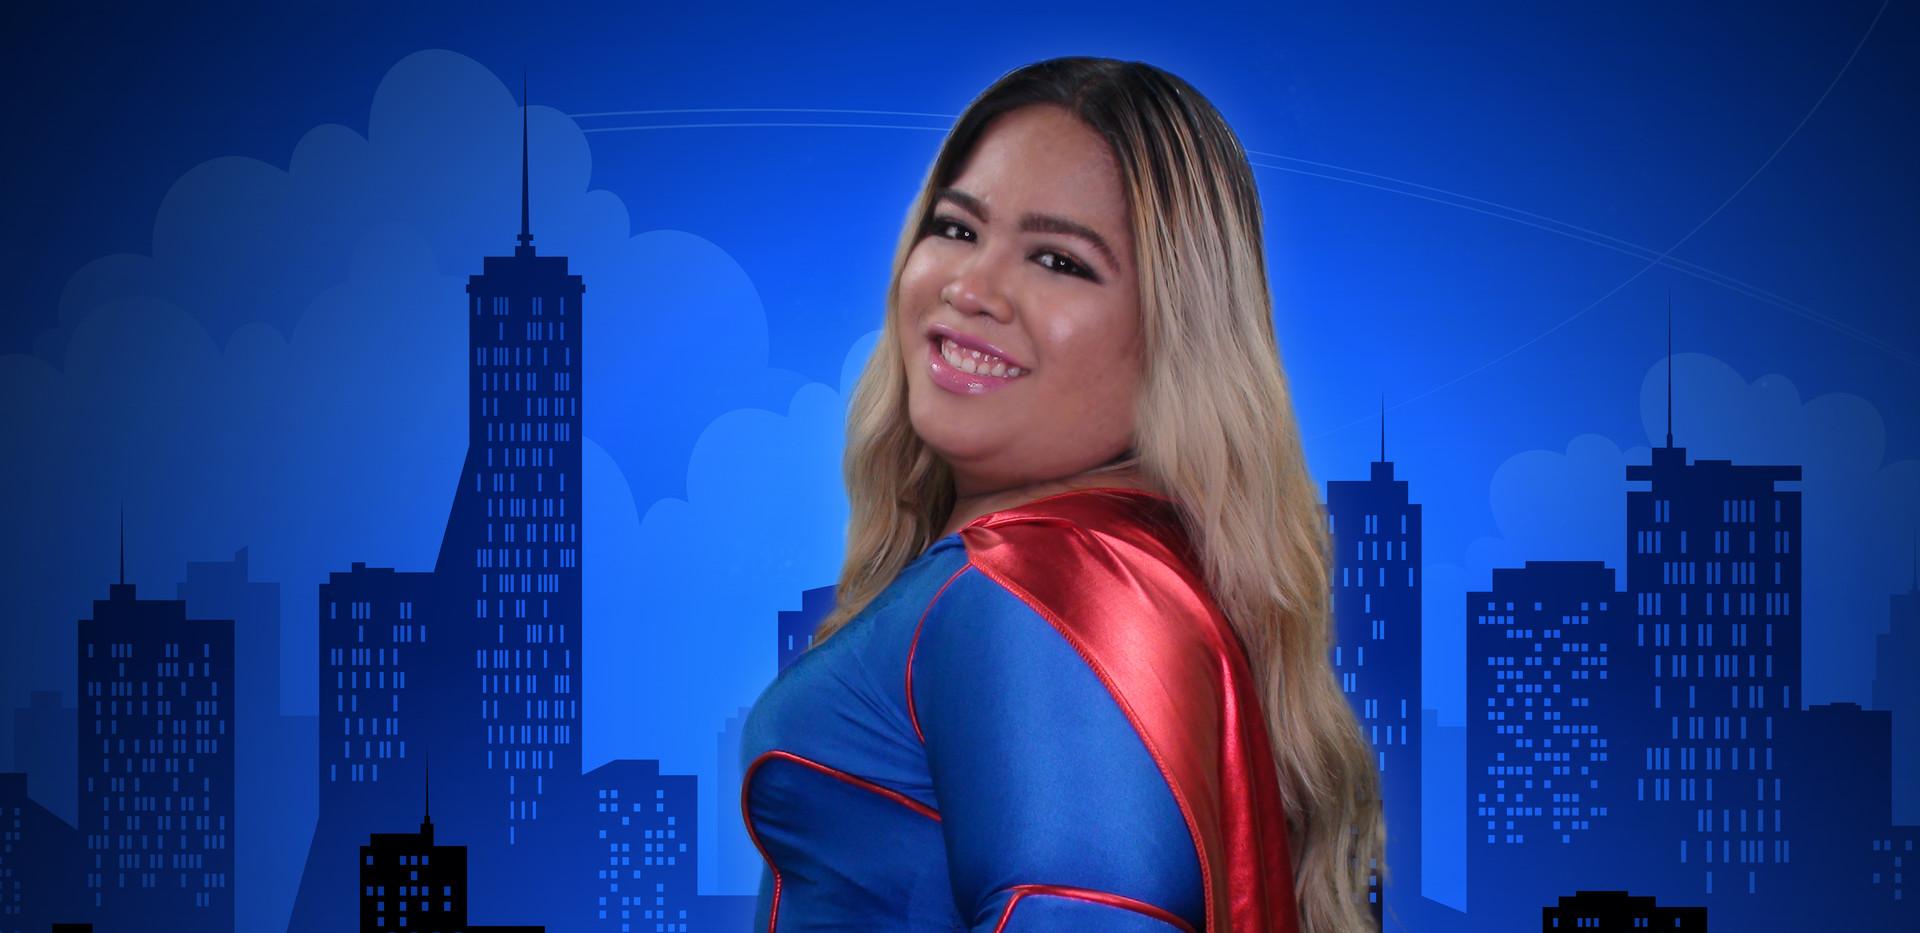 supergirl_fixed3.jpg